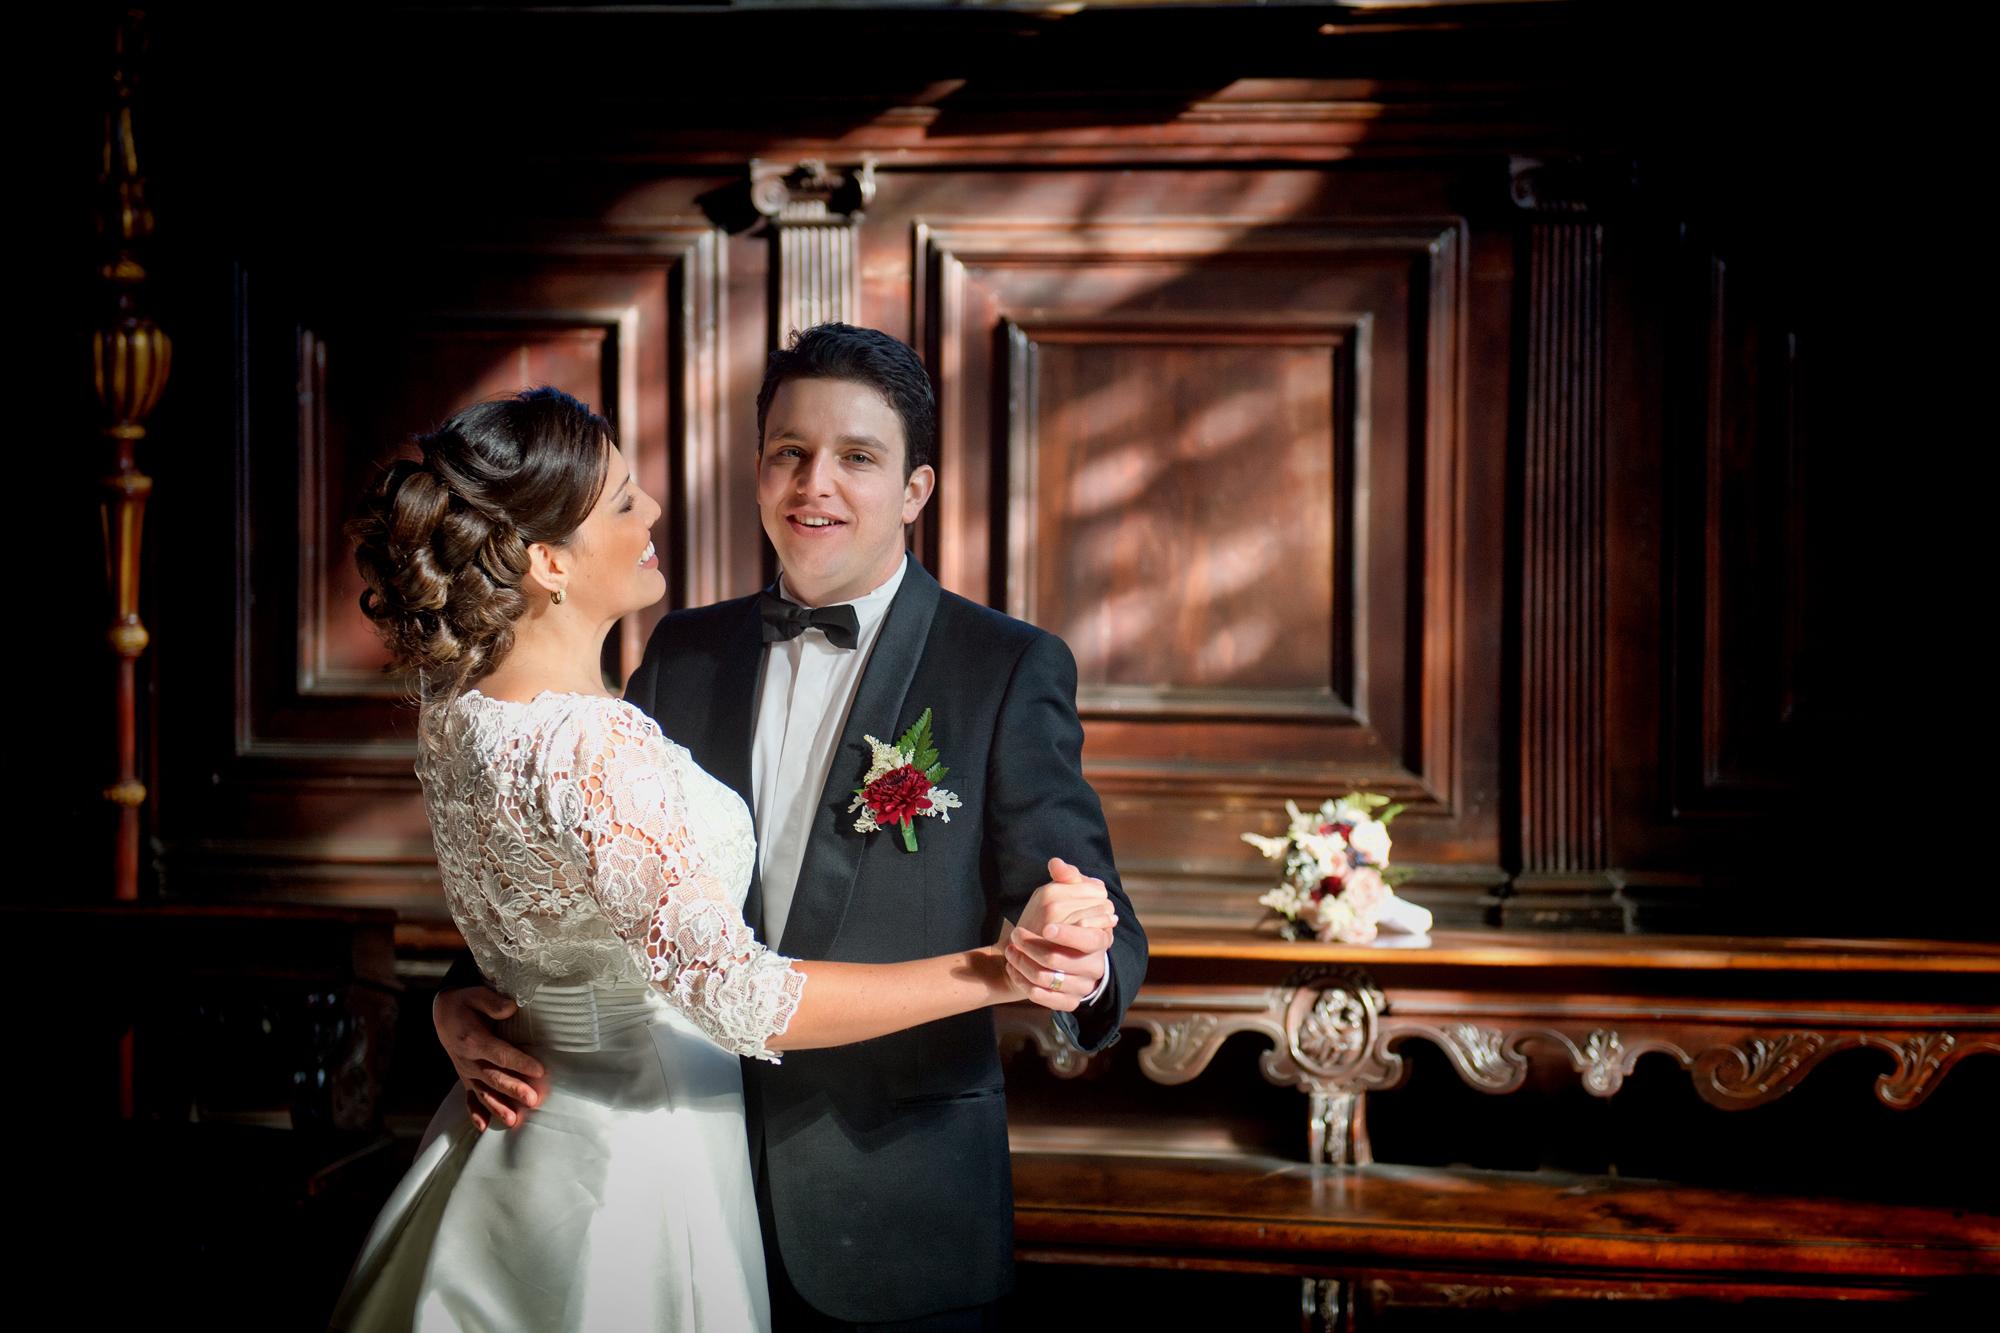 venezia matrimonio simbolico fotografia carmini laure jacquemin fotografo (32)